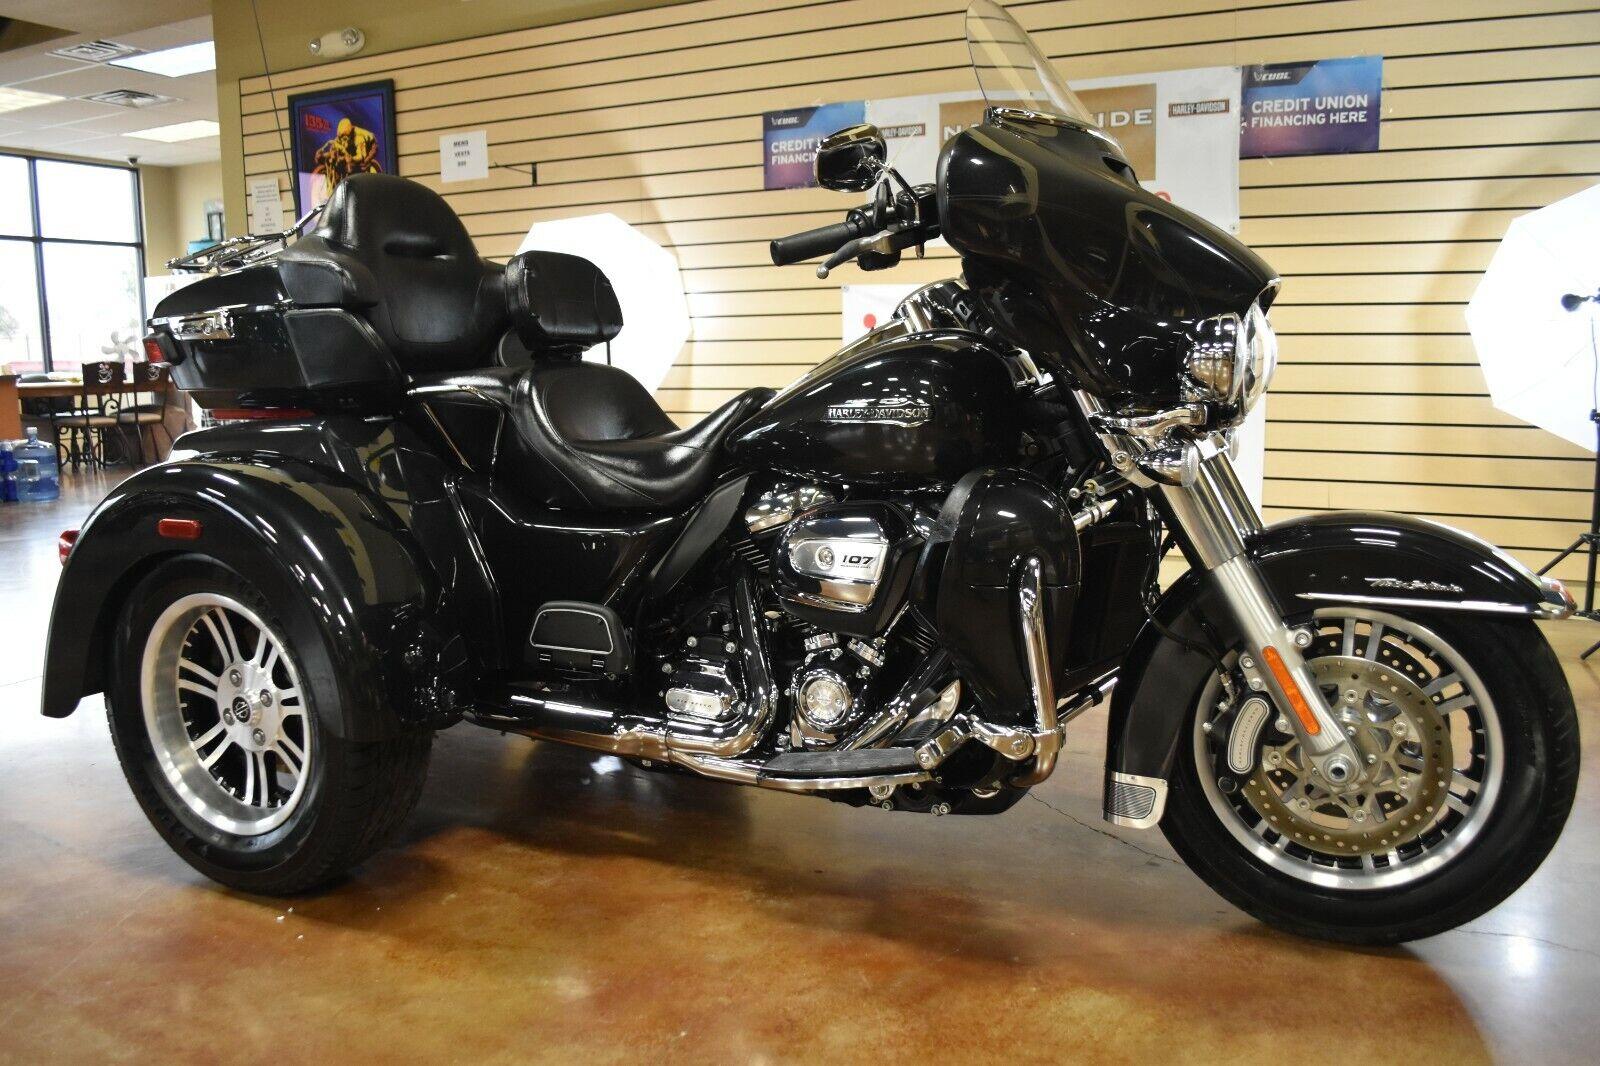 2018 Harley Davidson Tri Glide Trike Milwaukee Eight FLHTCUTG 107 NO RESERVE